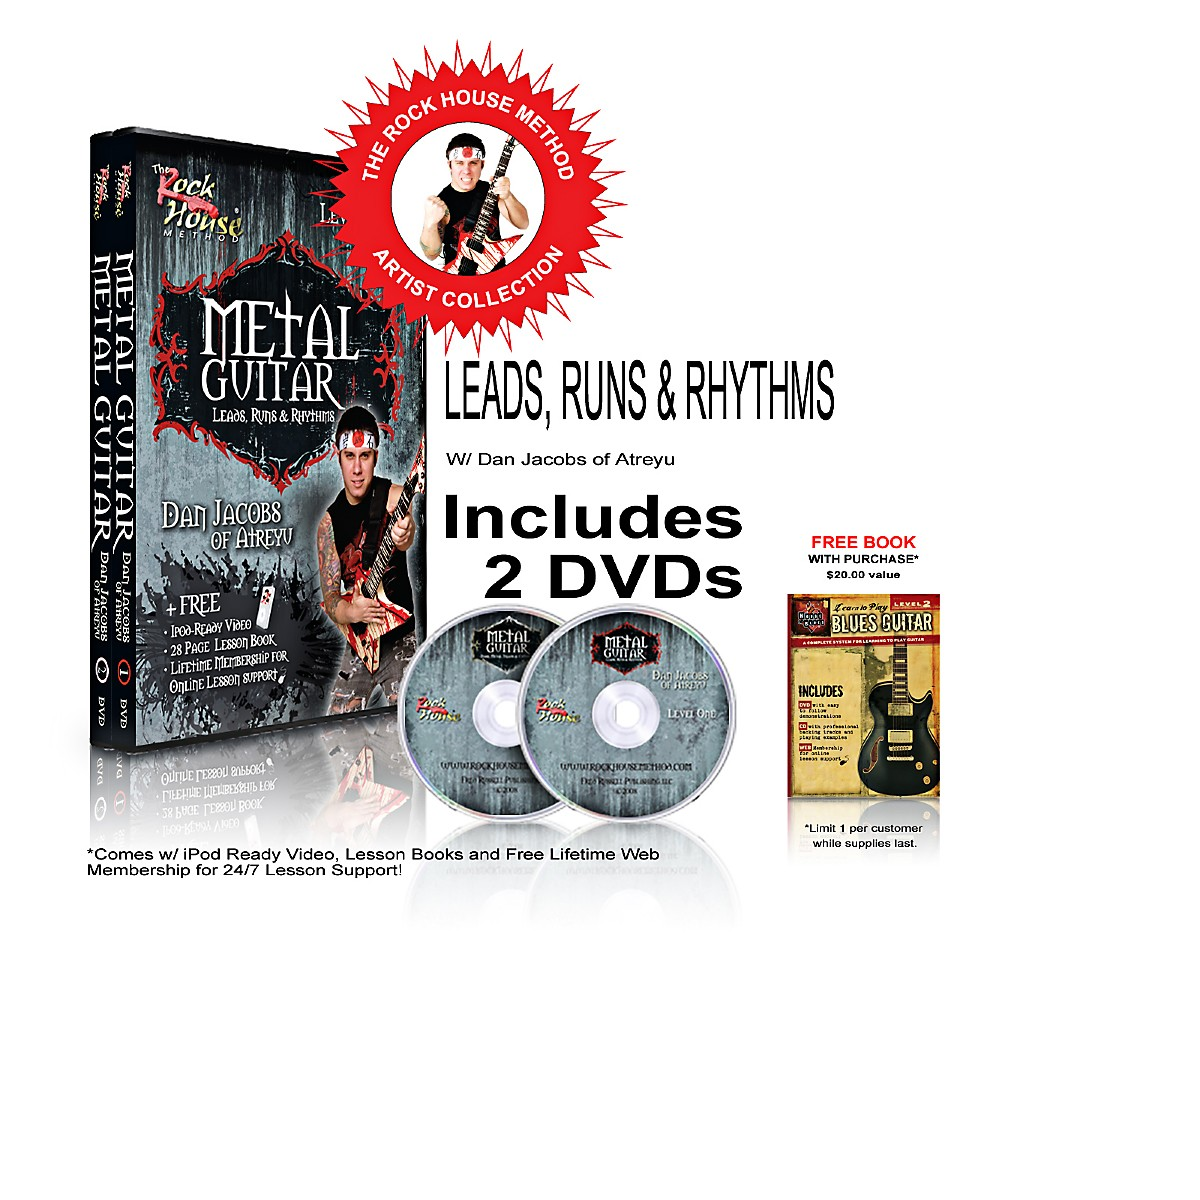 Hal Leonard The Rock House Method - Dan Jacobs DVD Collection